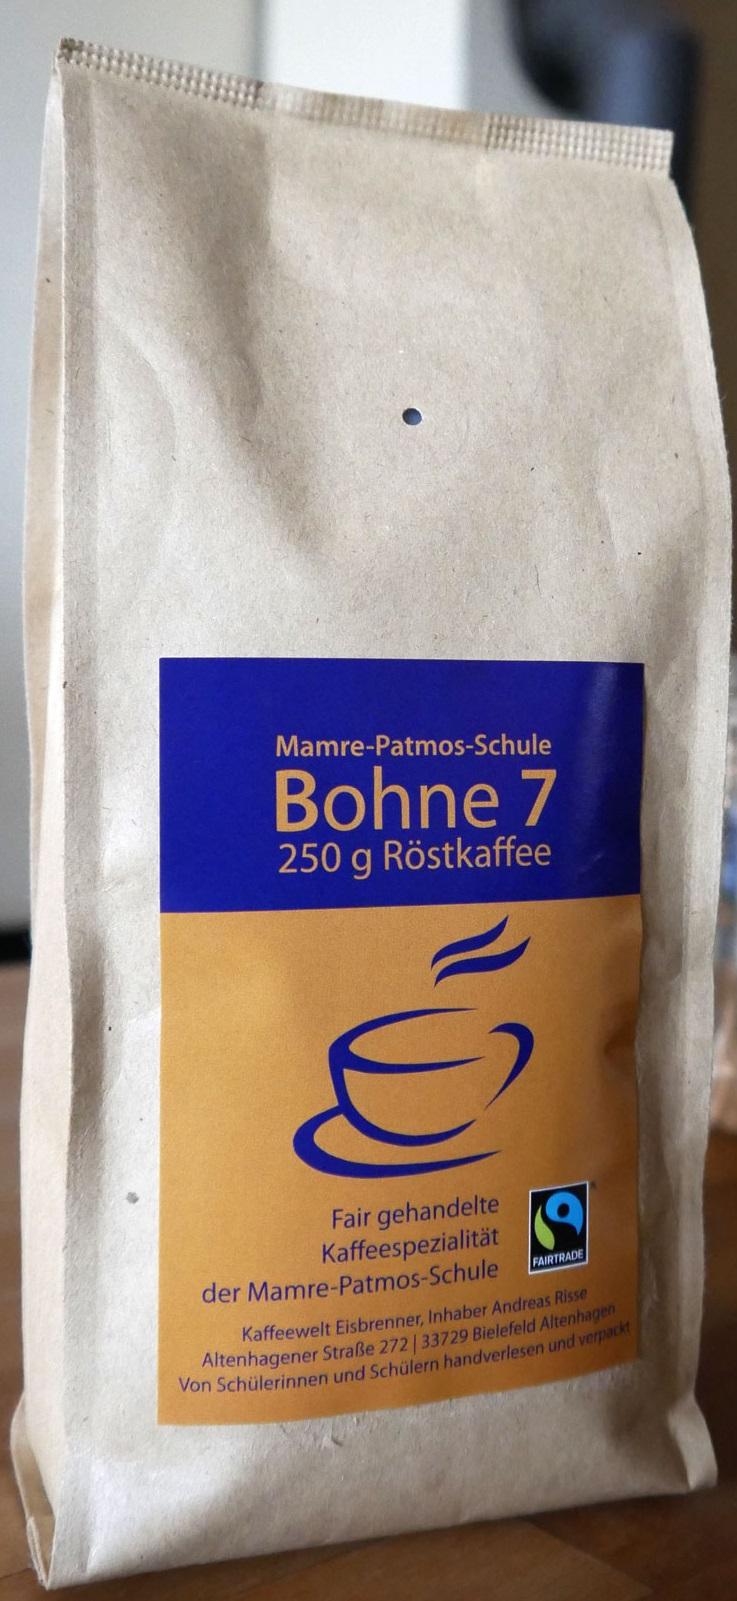 Bohne 7 - Mamre Patmos Schule